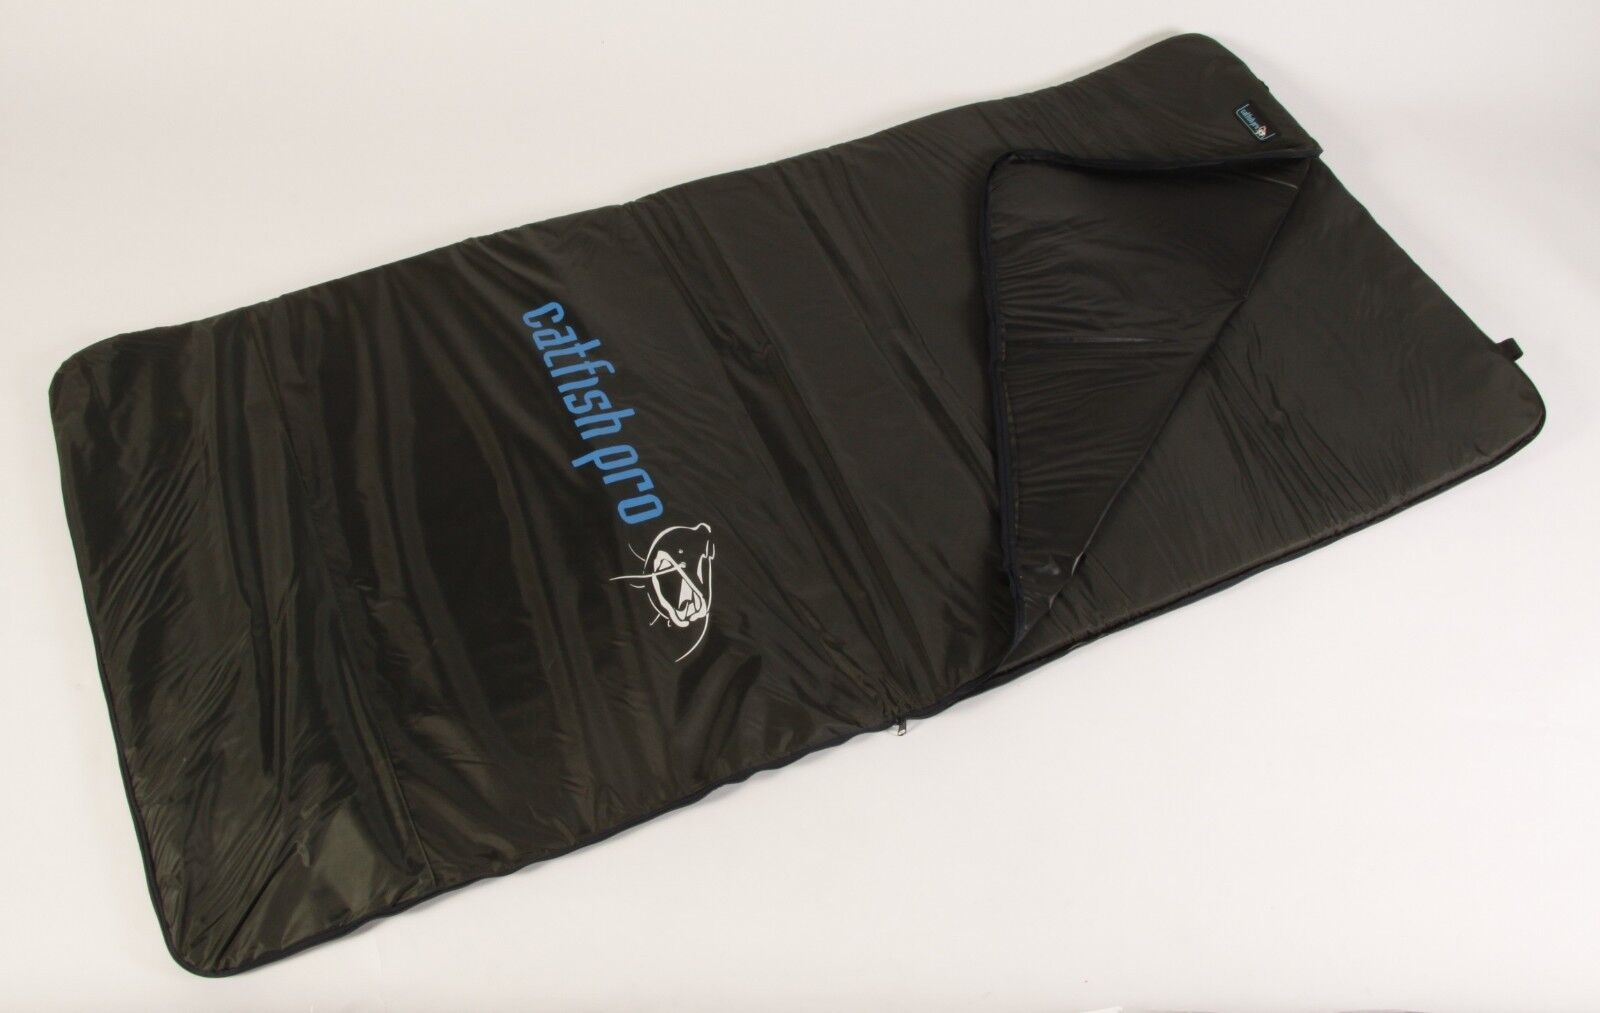 Catfish Pro Unhooking Mat With Flap All Größes NEW Catfish Fishing Mat